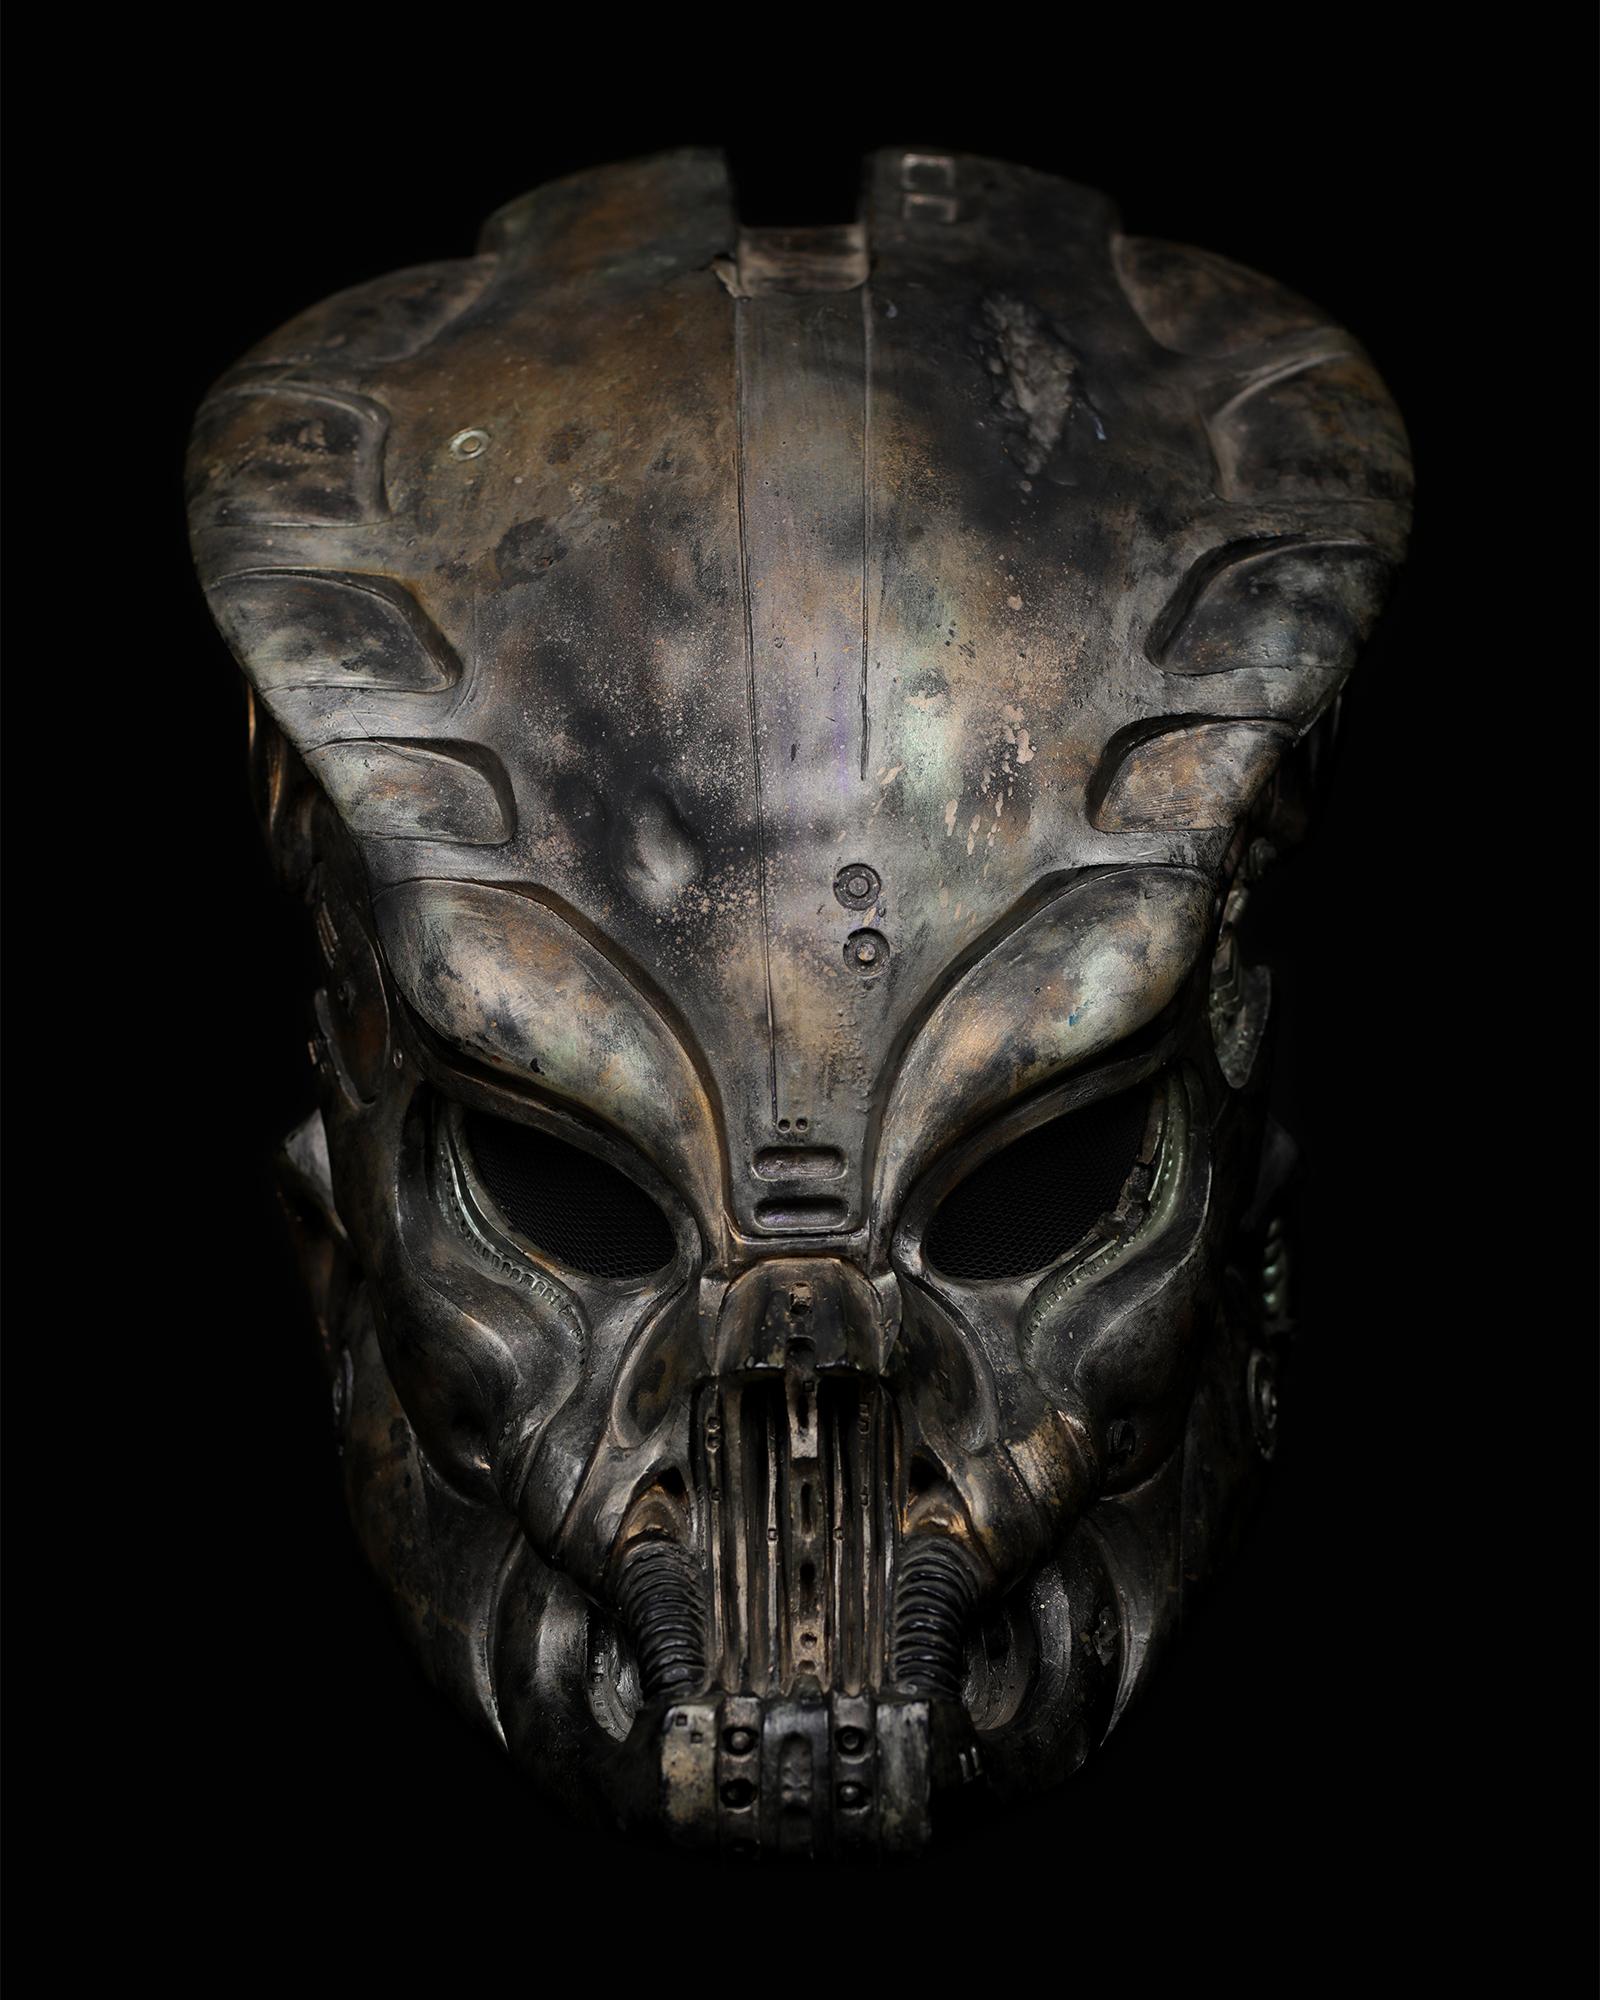 Pedator-bio-mask-helmet-original-prop-01.jpg